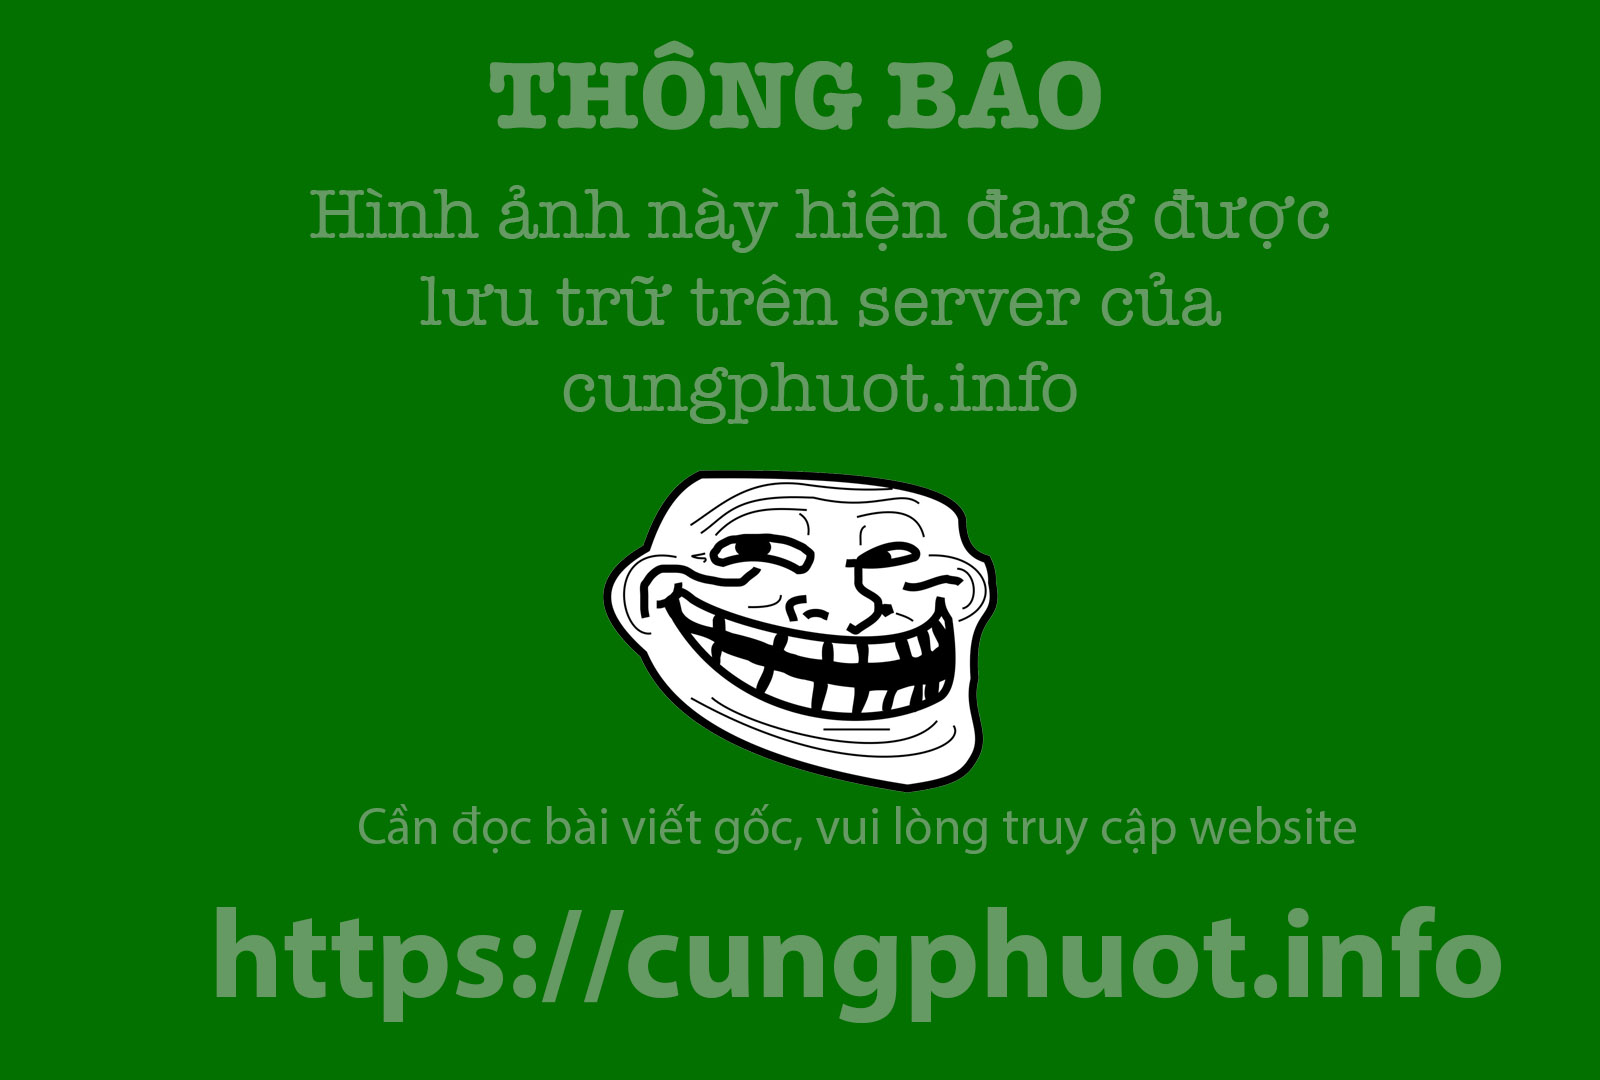 Co do Lam Kinh nhin tu tren cao hinh anh 7